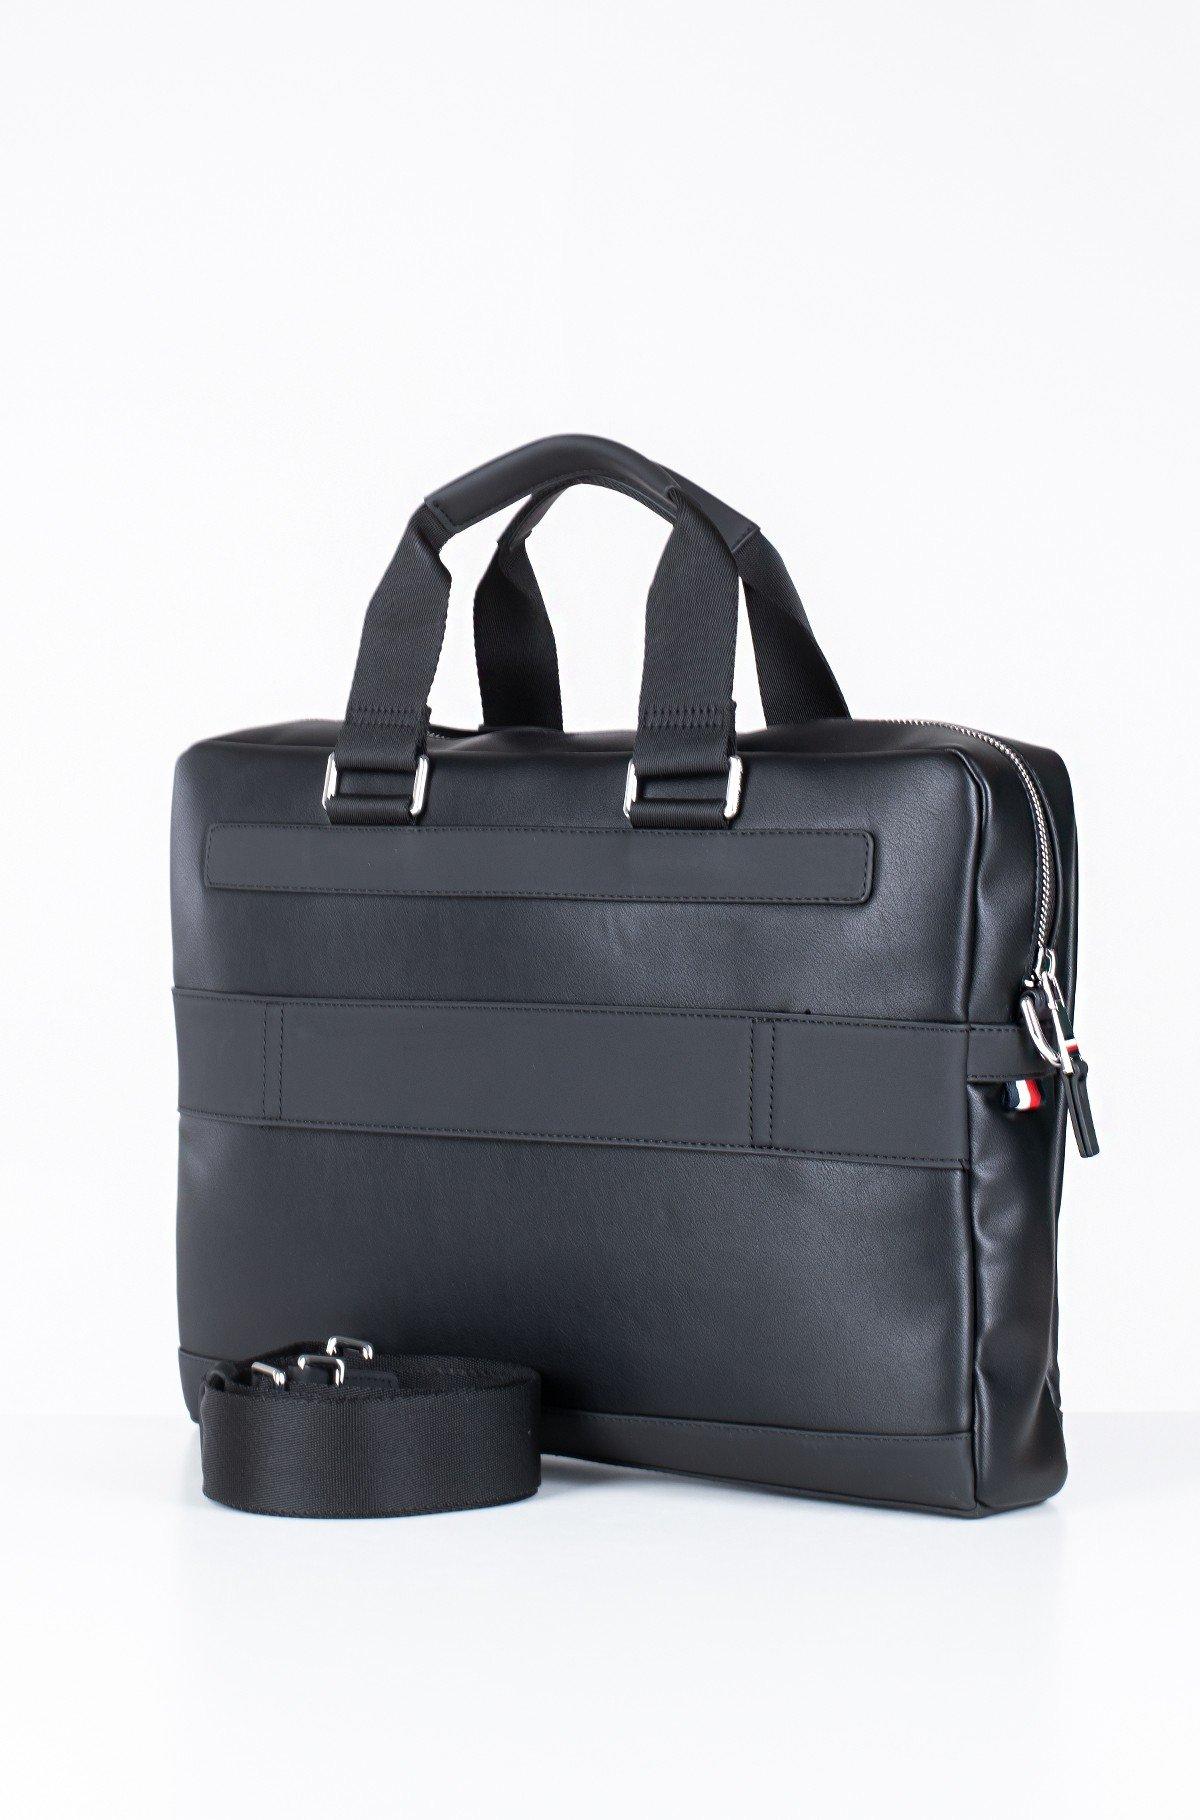 Kompiuterio krepšys  TH METRO COMPUTER BAG-full-2